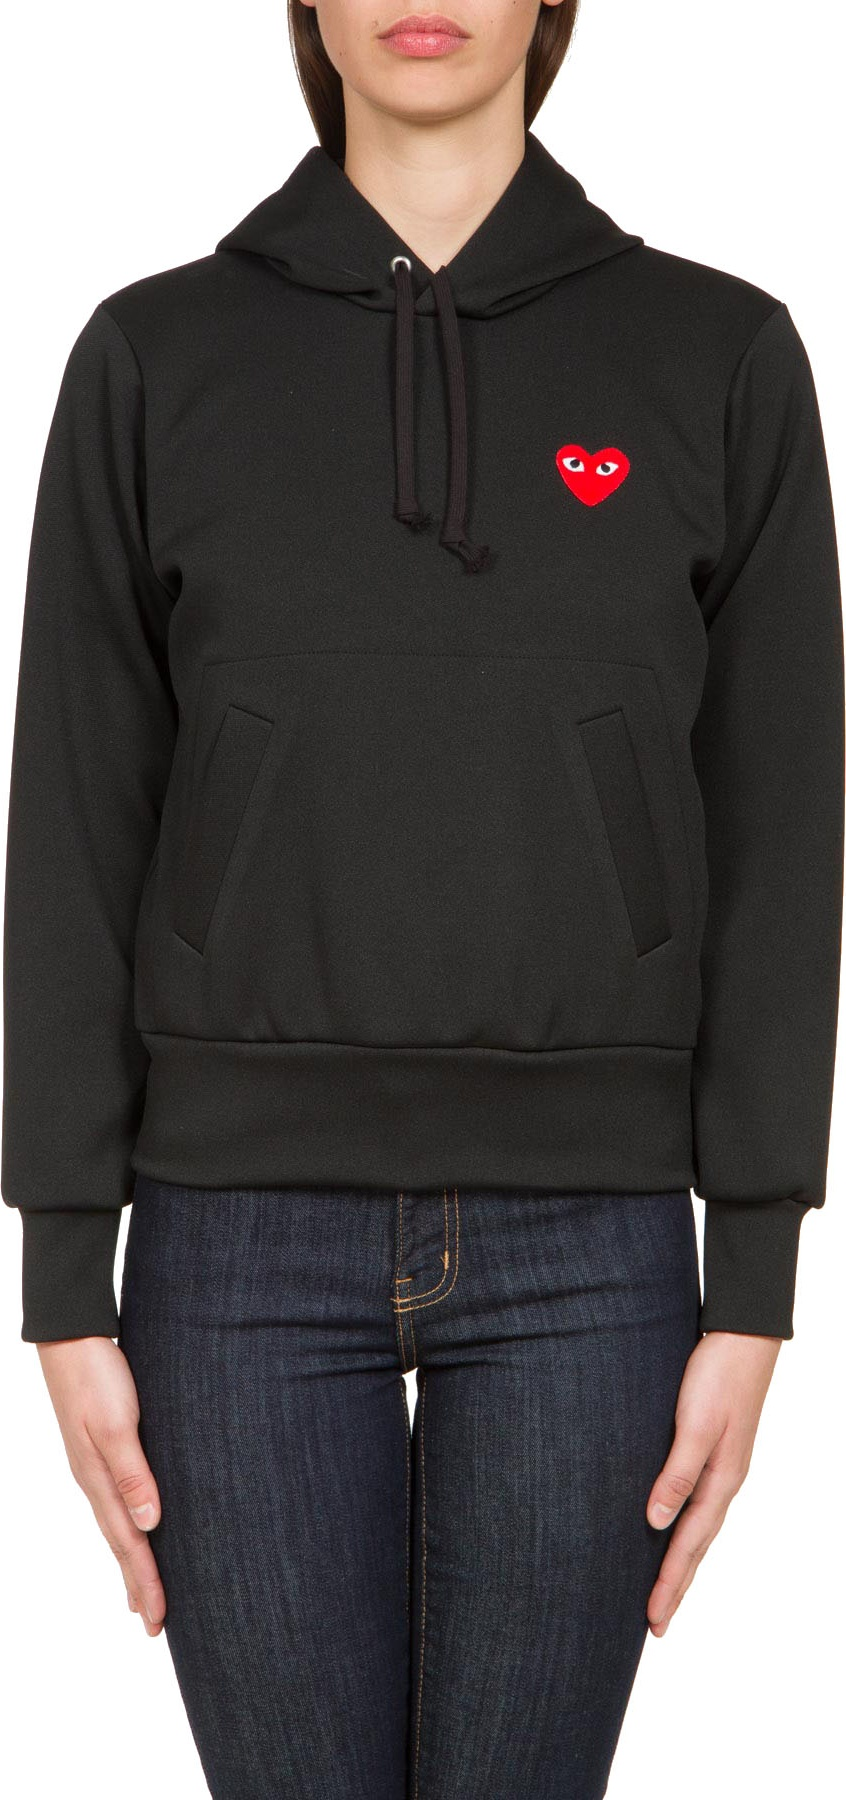 e271f429b734 Comme des Garçons Play  Red Heart Pullover Hoodie - Black ...